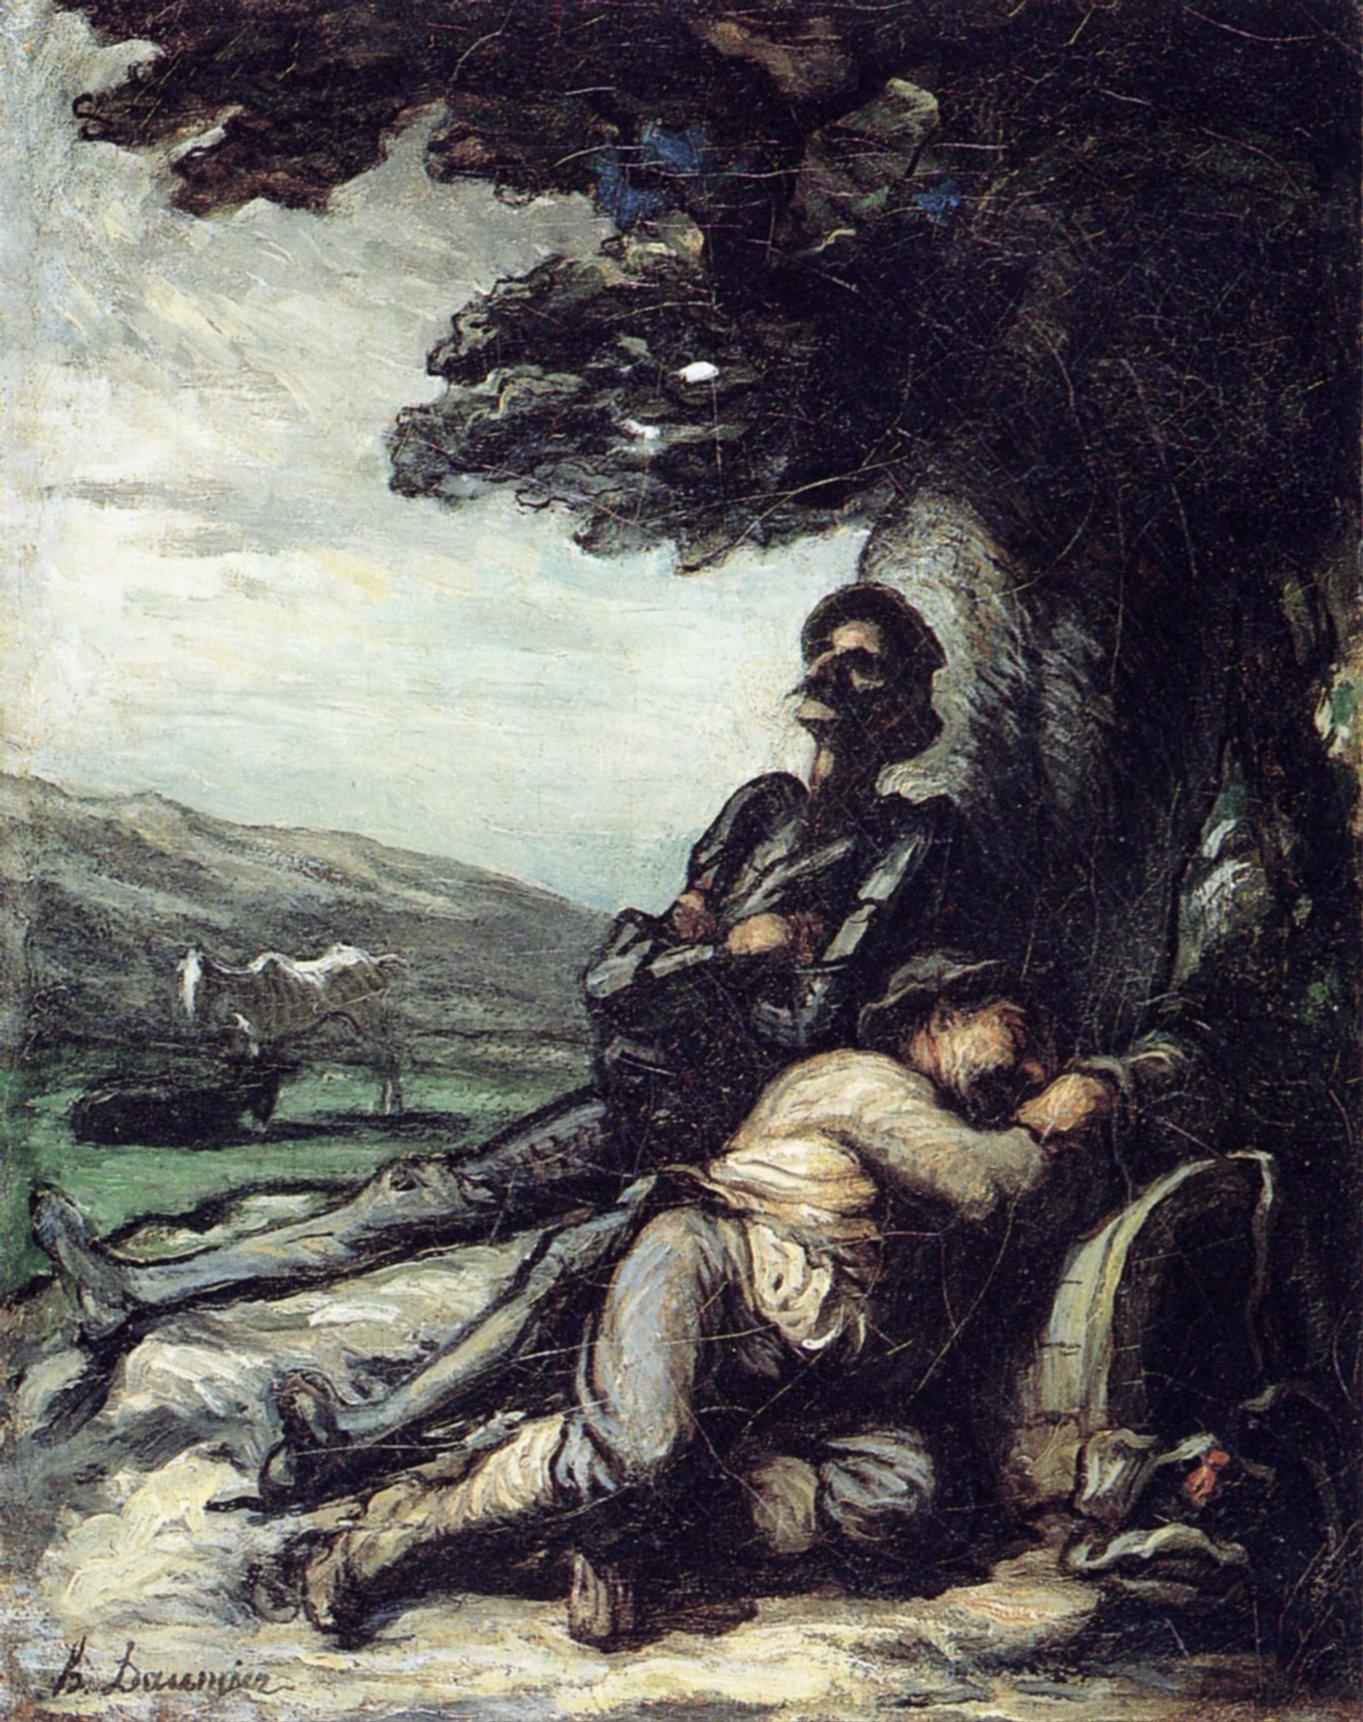 don-quixote-and-sancho-pansa-having-a-rest-under-a-tree_Daumier